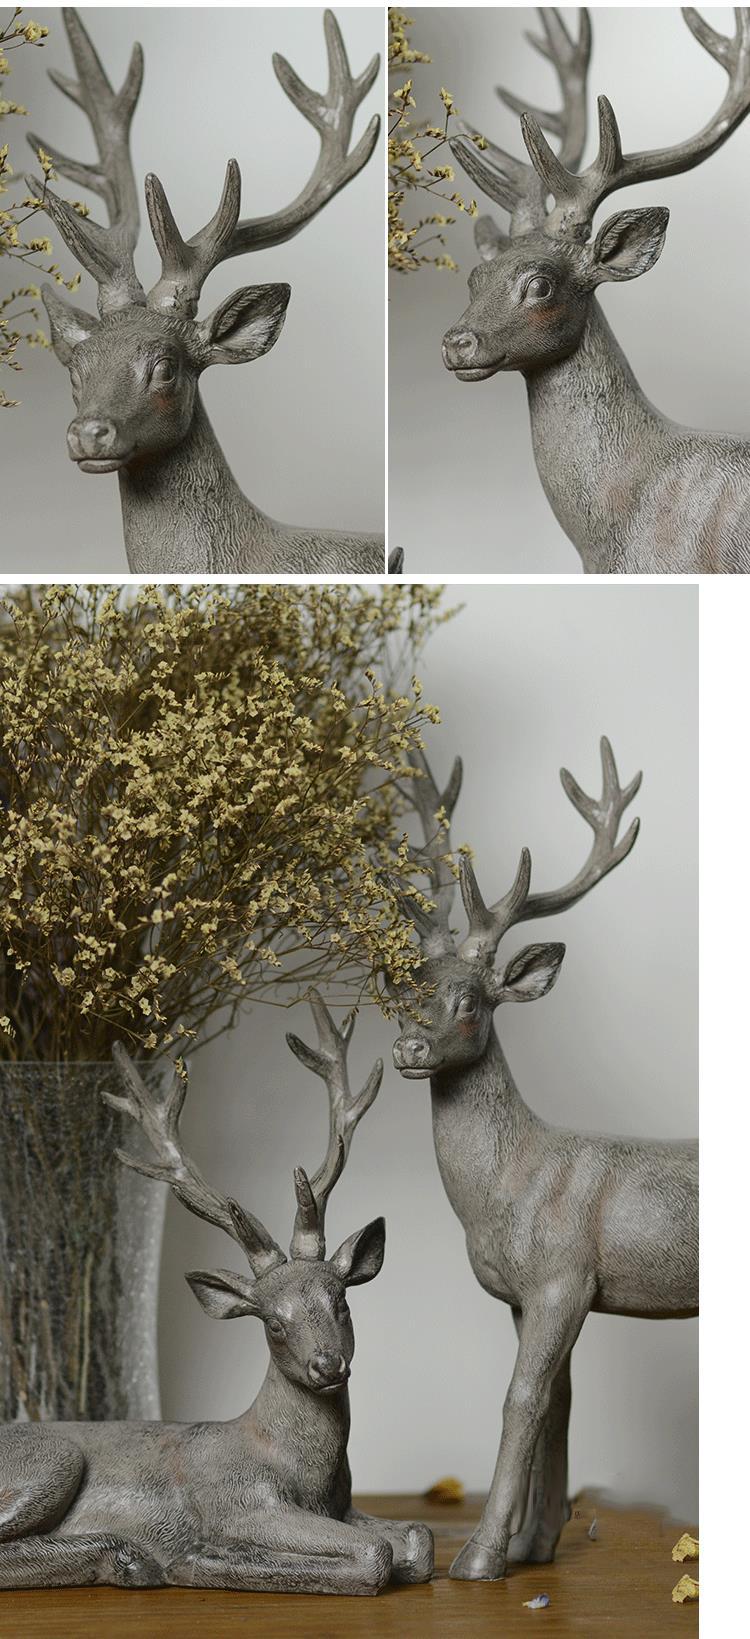 Rustic Standing Deer Statue Resin Animal Craft Retro Home Decoration Accessories Squat Elk Sculpture Decorations Creative Gift